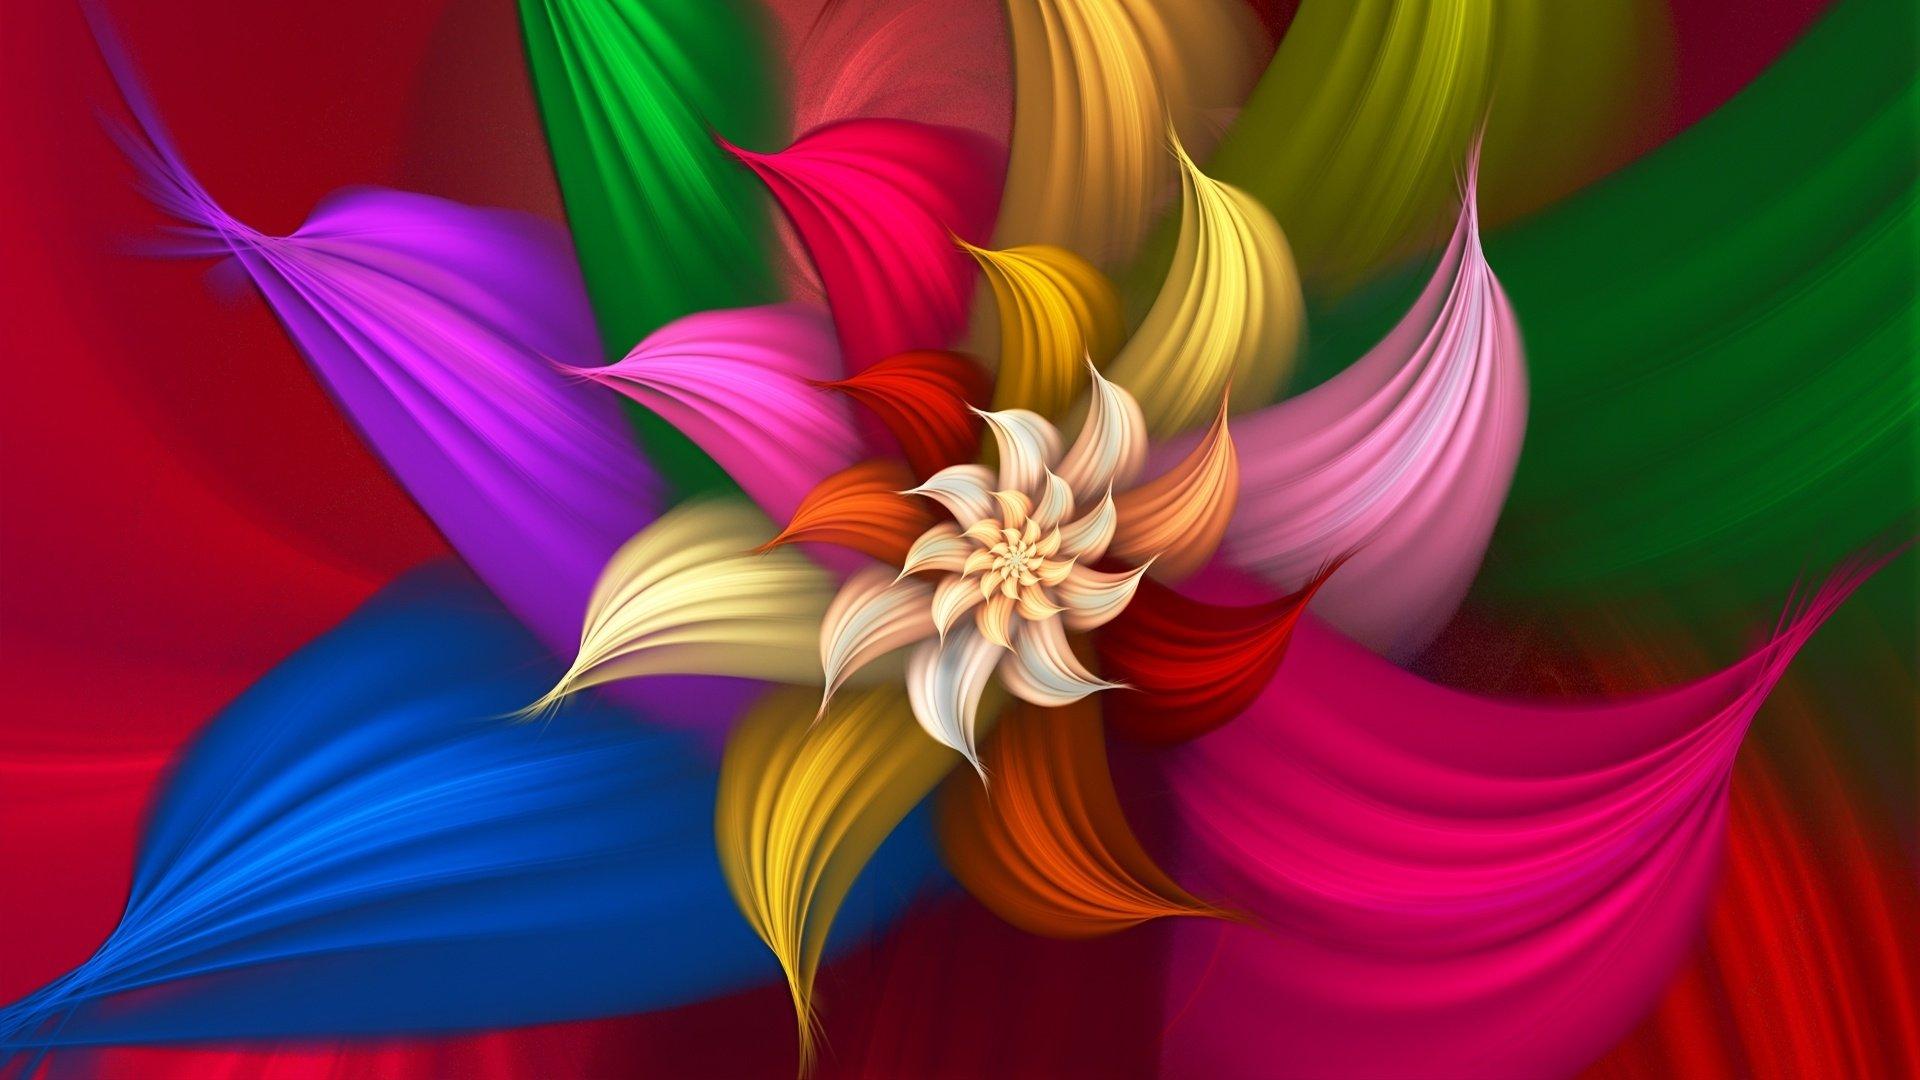 Art Flower Wallpaper.